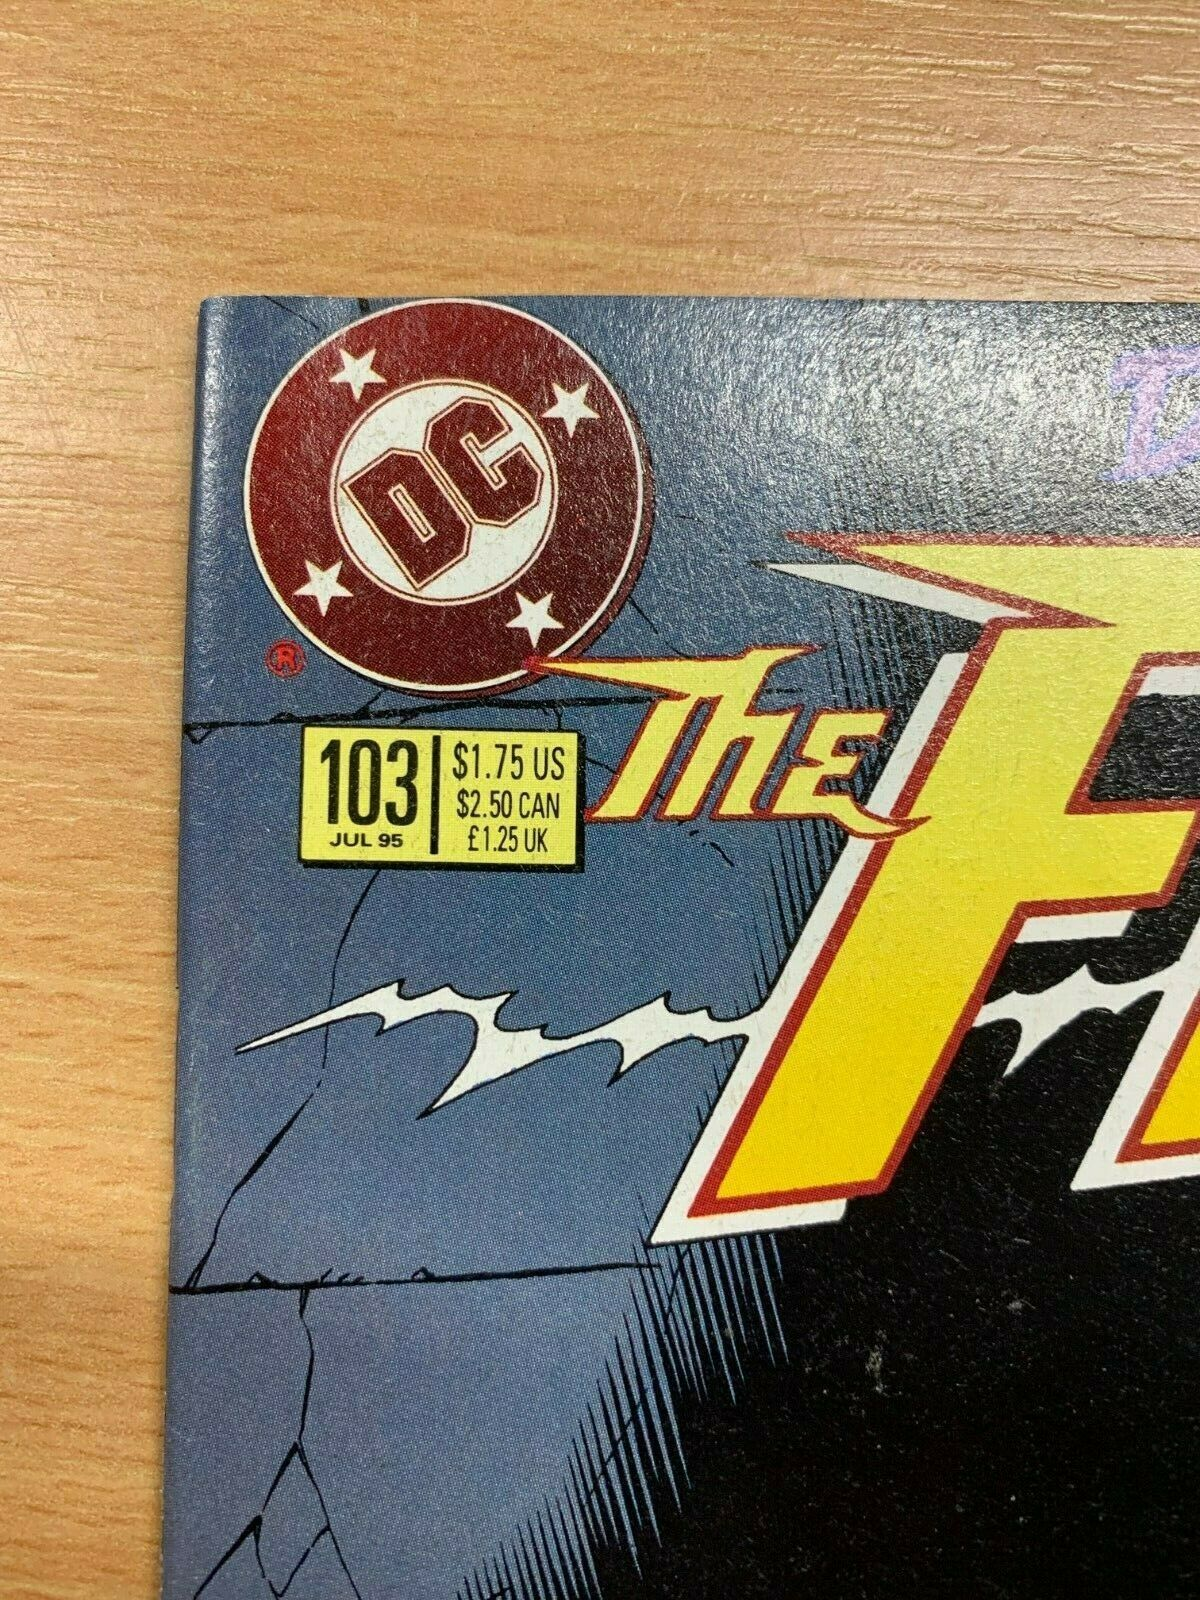 DC COMICS - FLASH #103 (JULY 1995) VFN COND - (NEW BAG & BOARD)